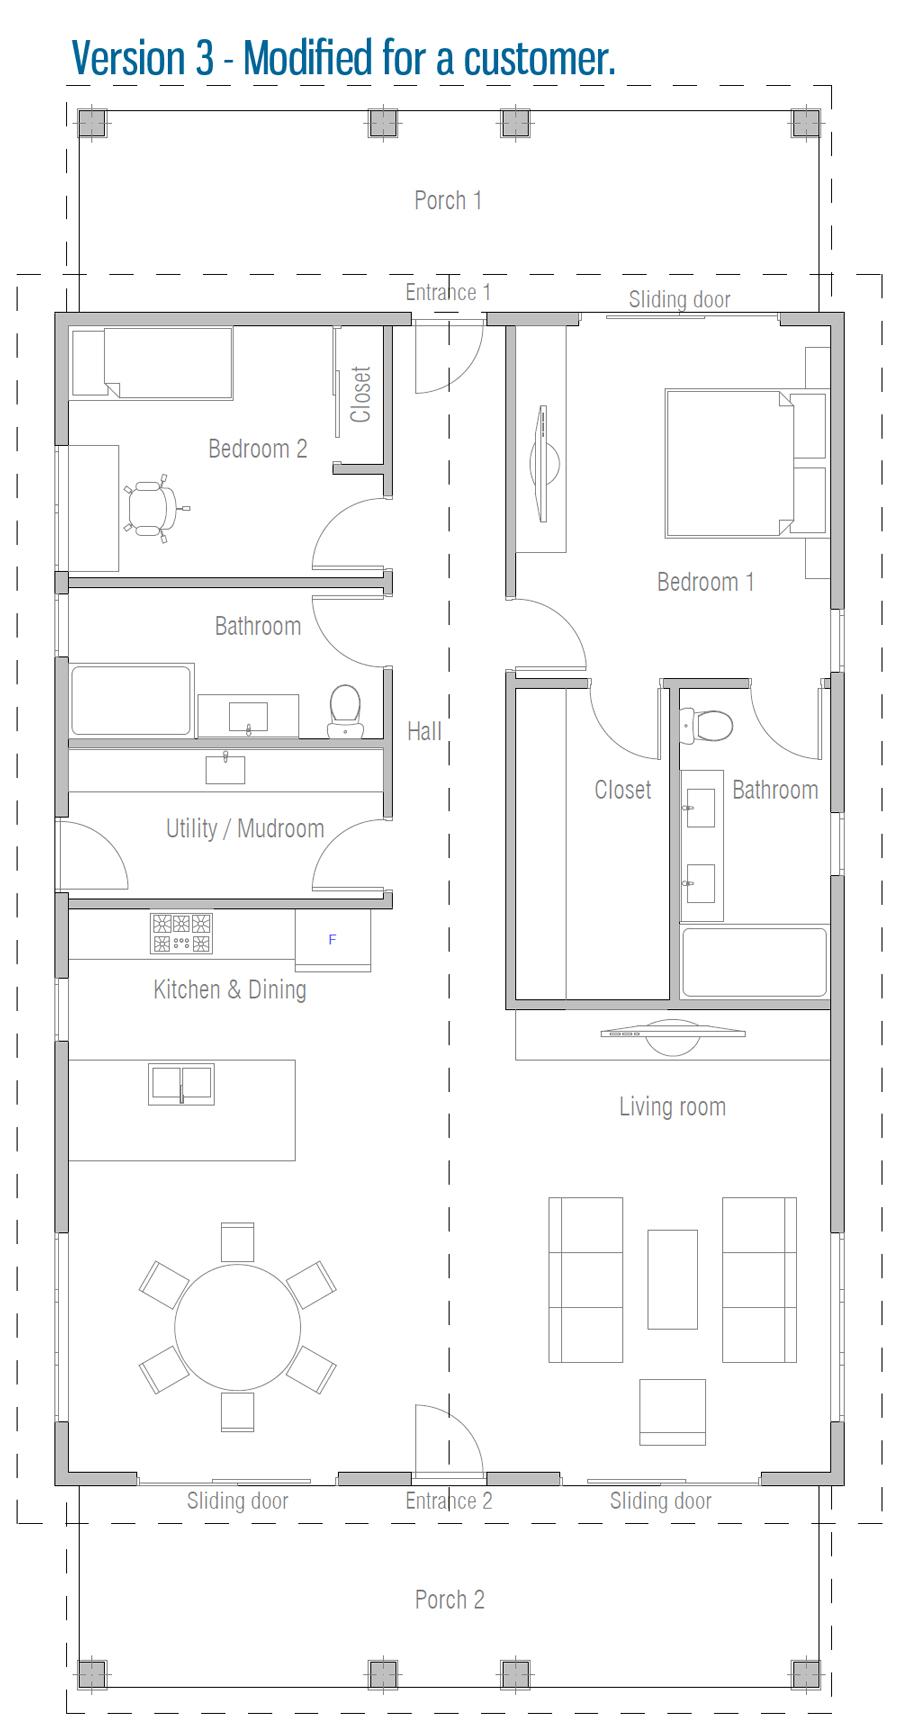 house-plans-2021_35_HOUSE_PLAN_CH673_V3.jpg